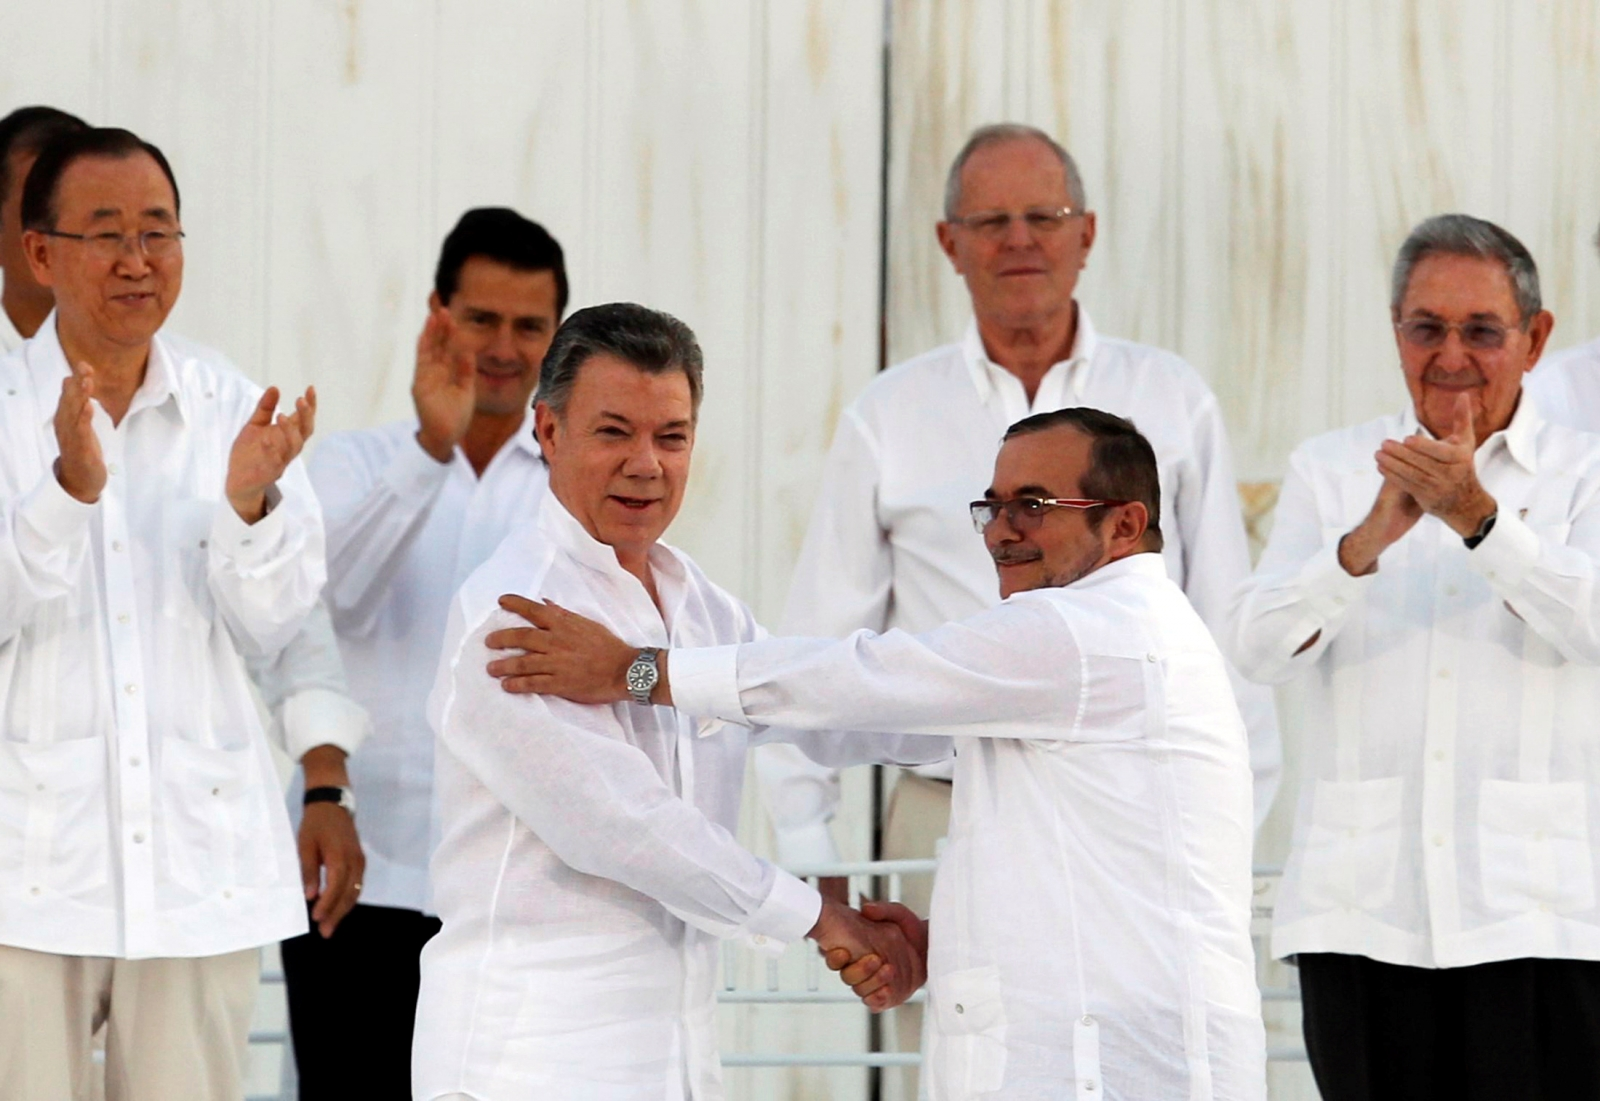 Columbia-Farc peace deal